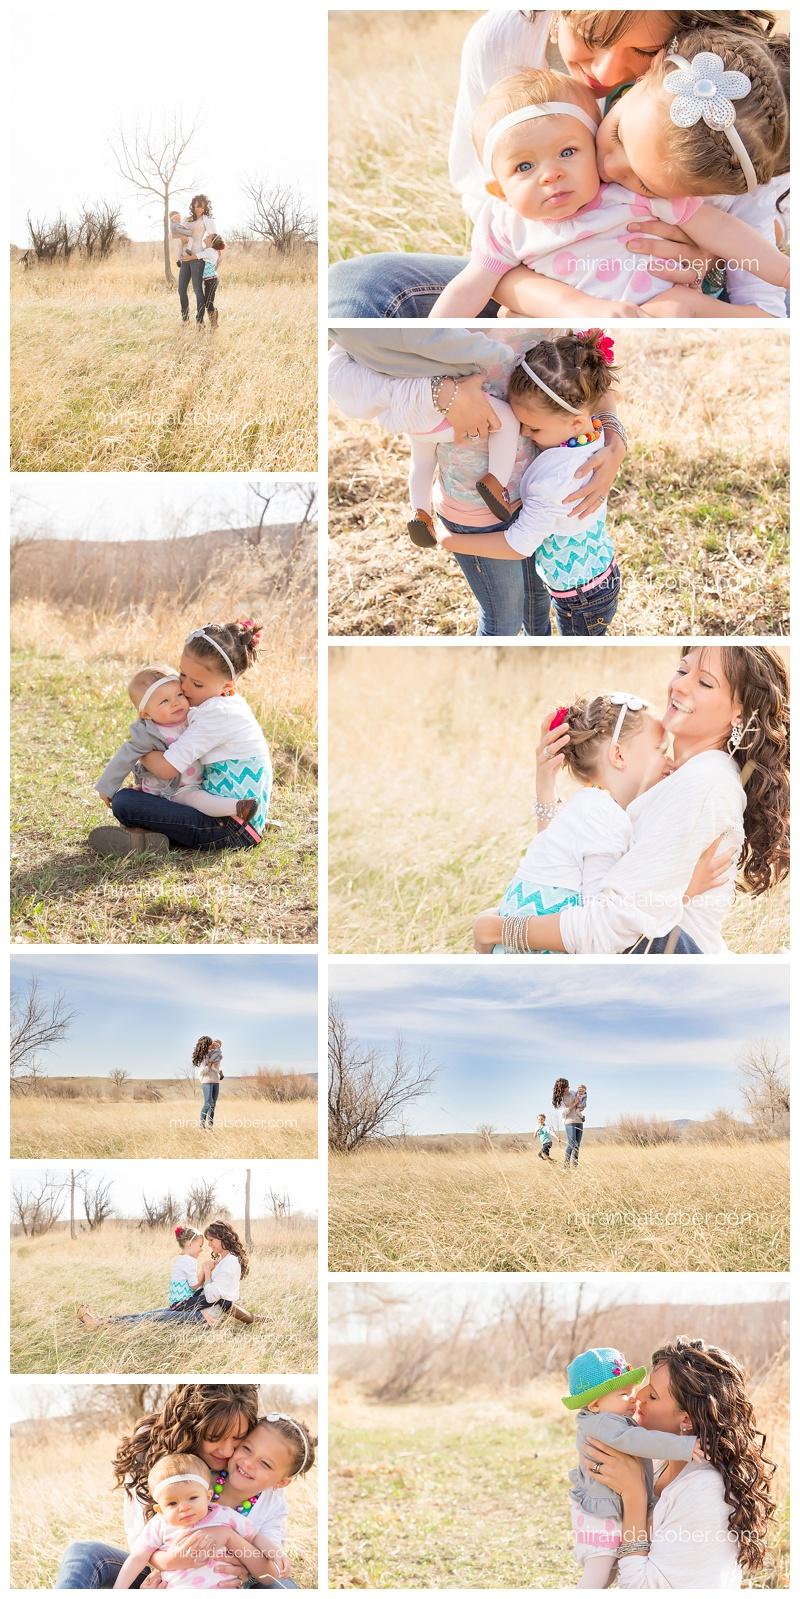 family photo session, Miranda L. Sober Photography